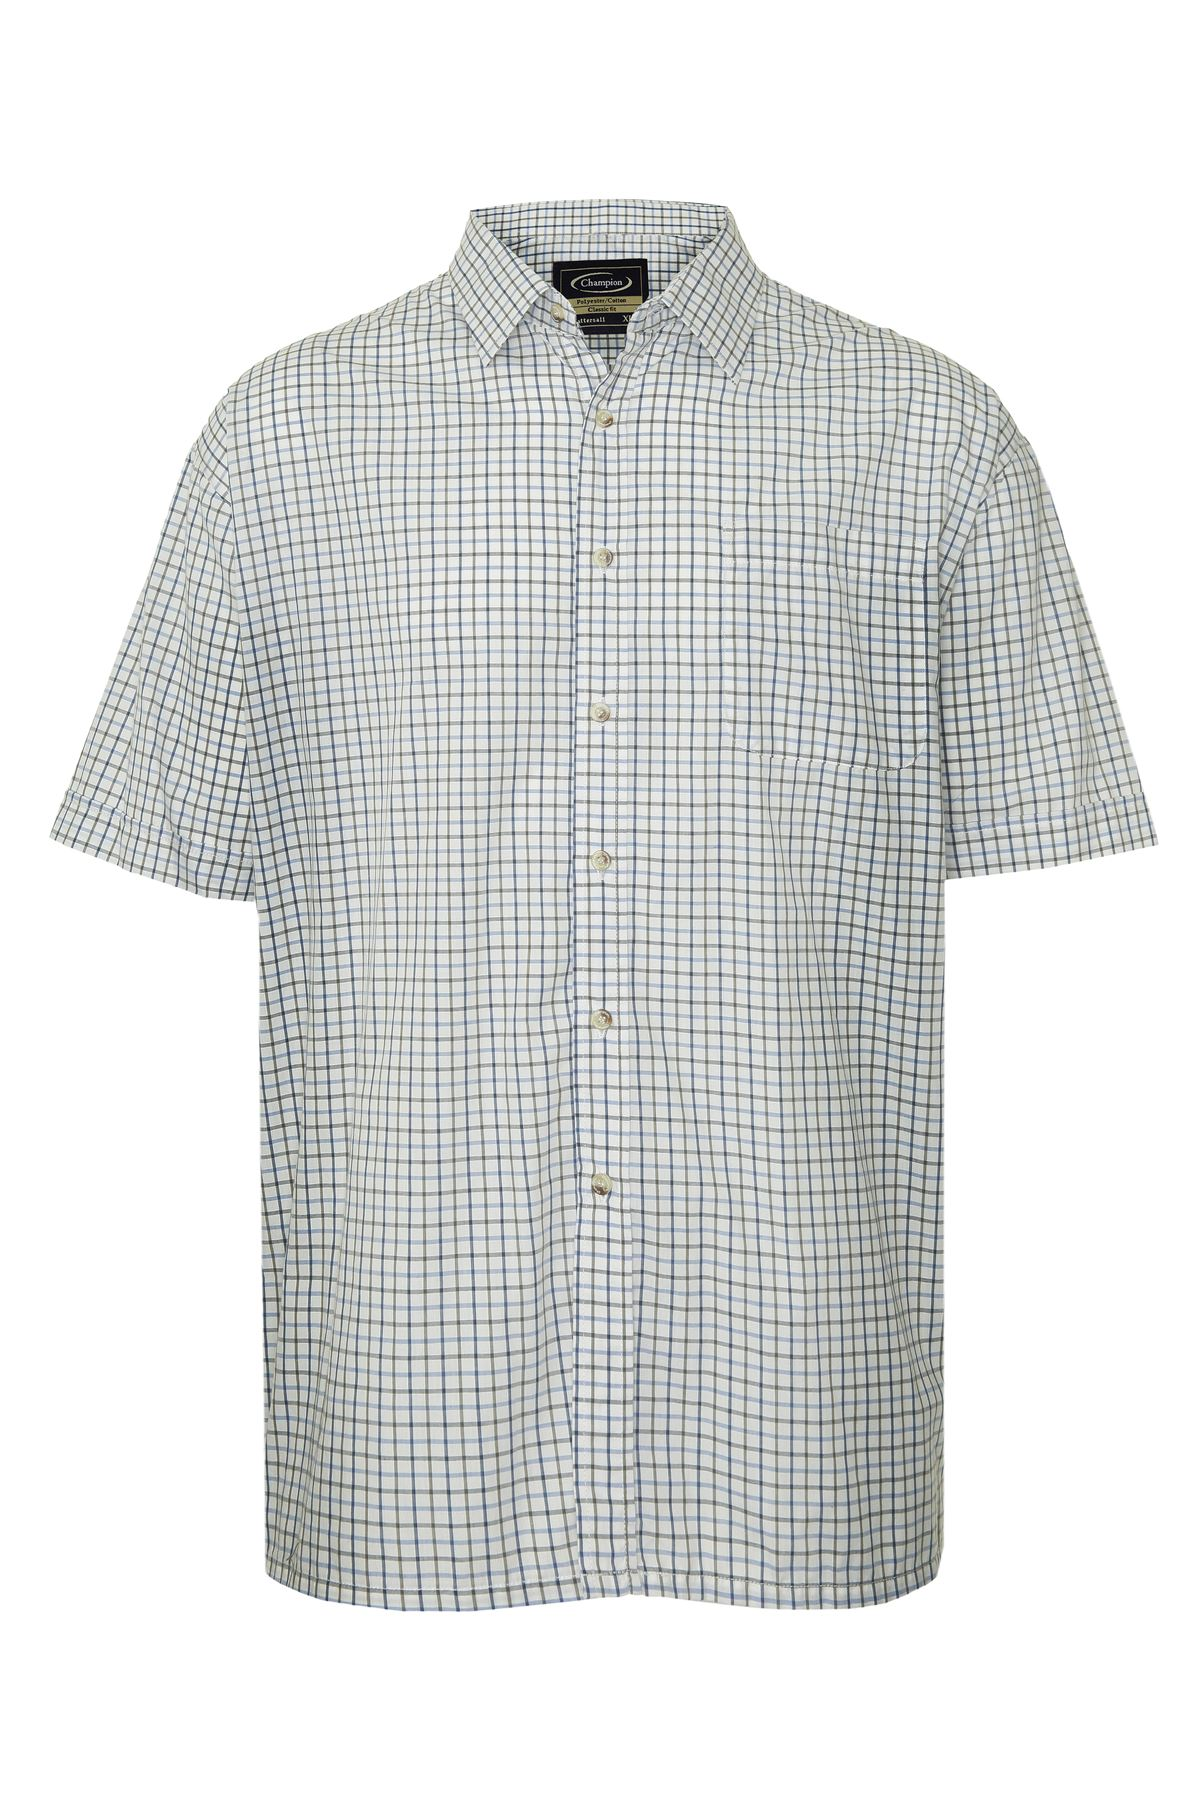 Champion-Mens-Shirt-Check-Short-Sleeve-Polycotton-Country-Casual thumbnail 4